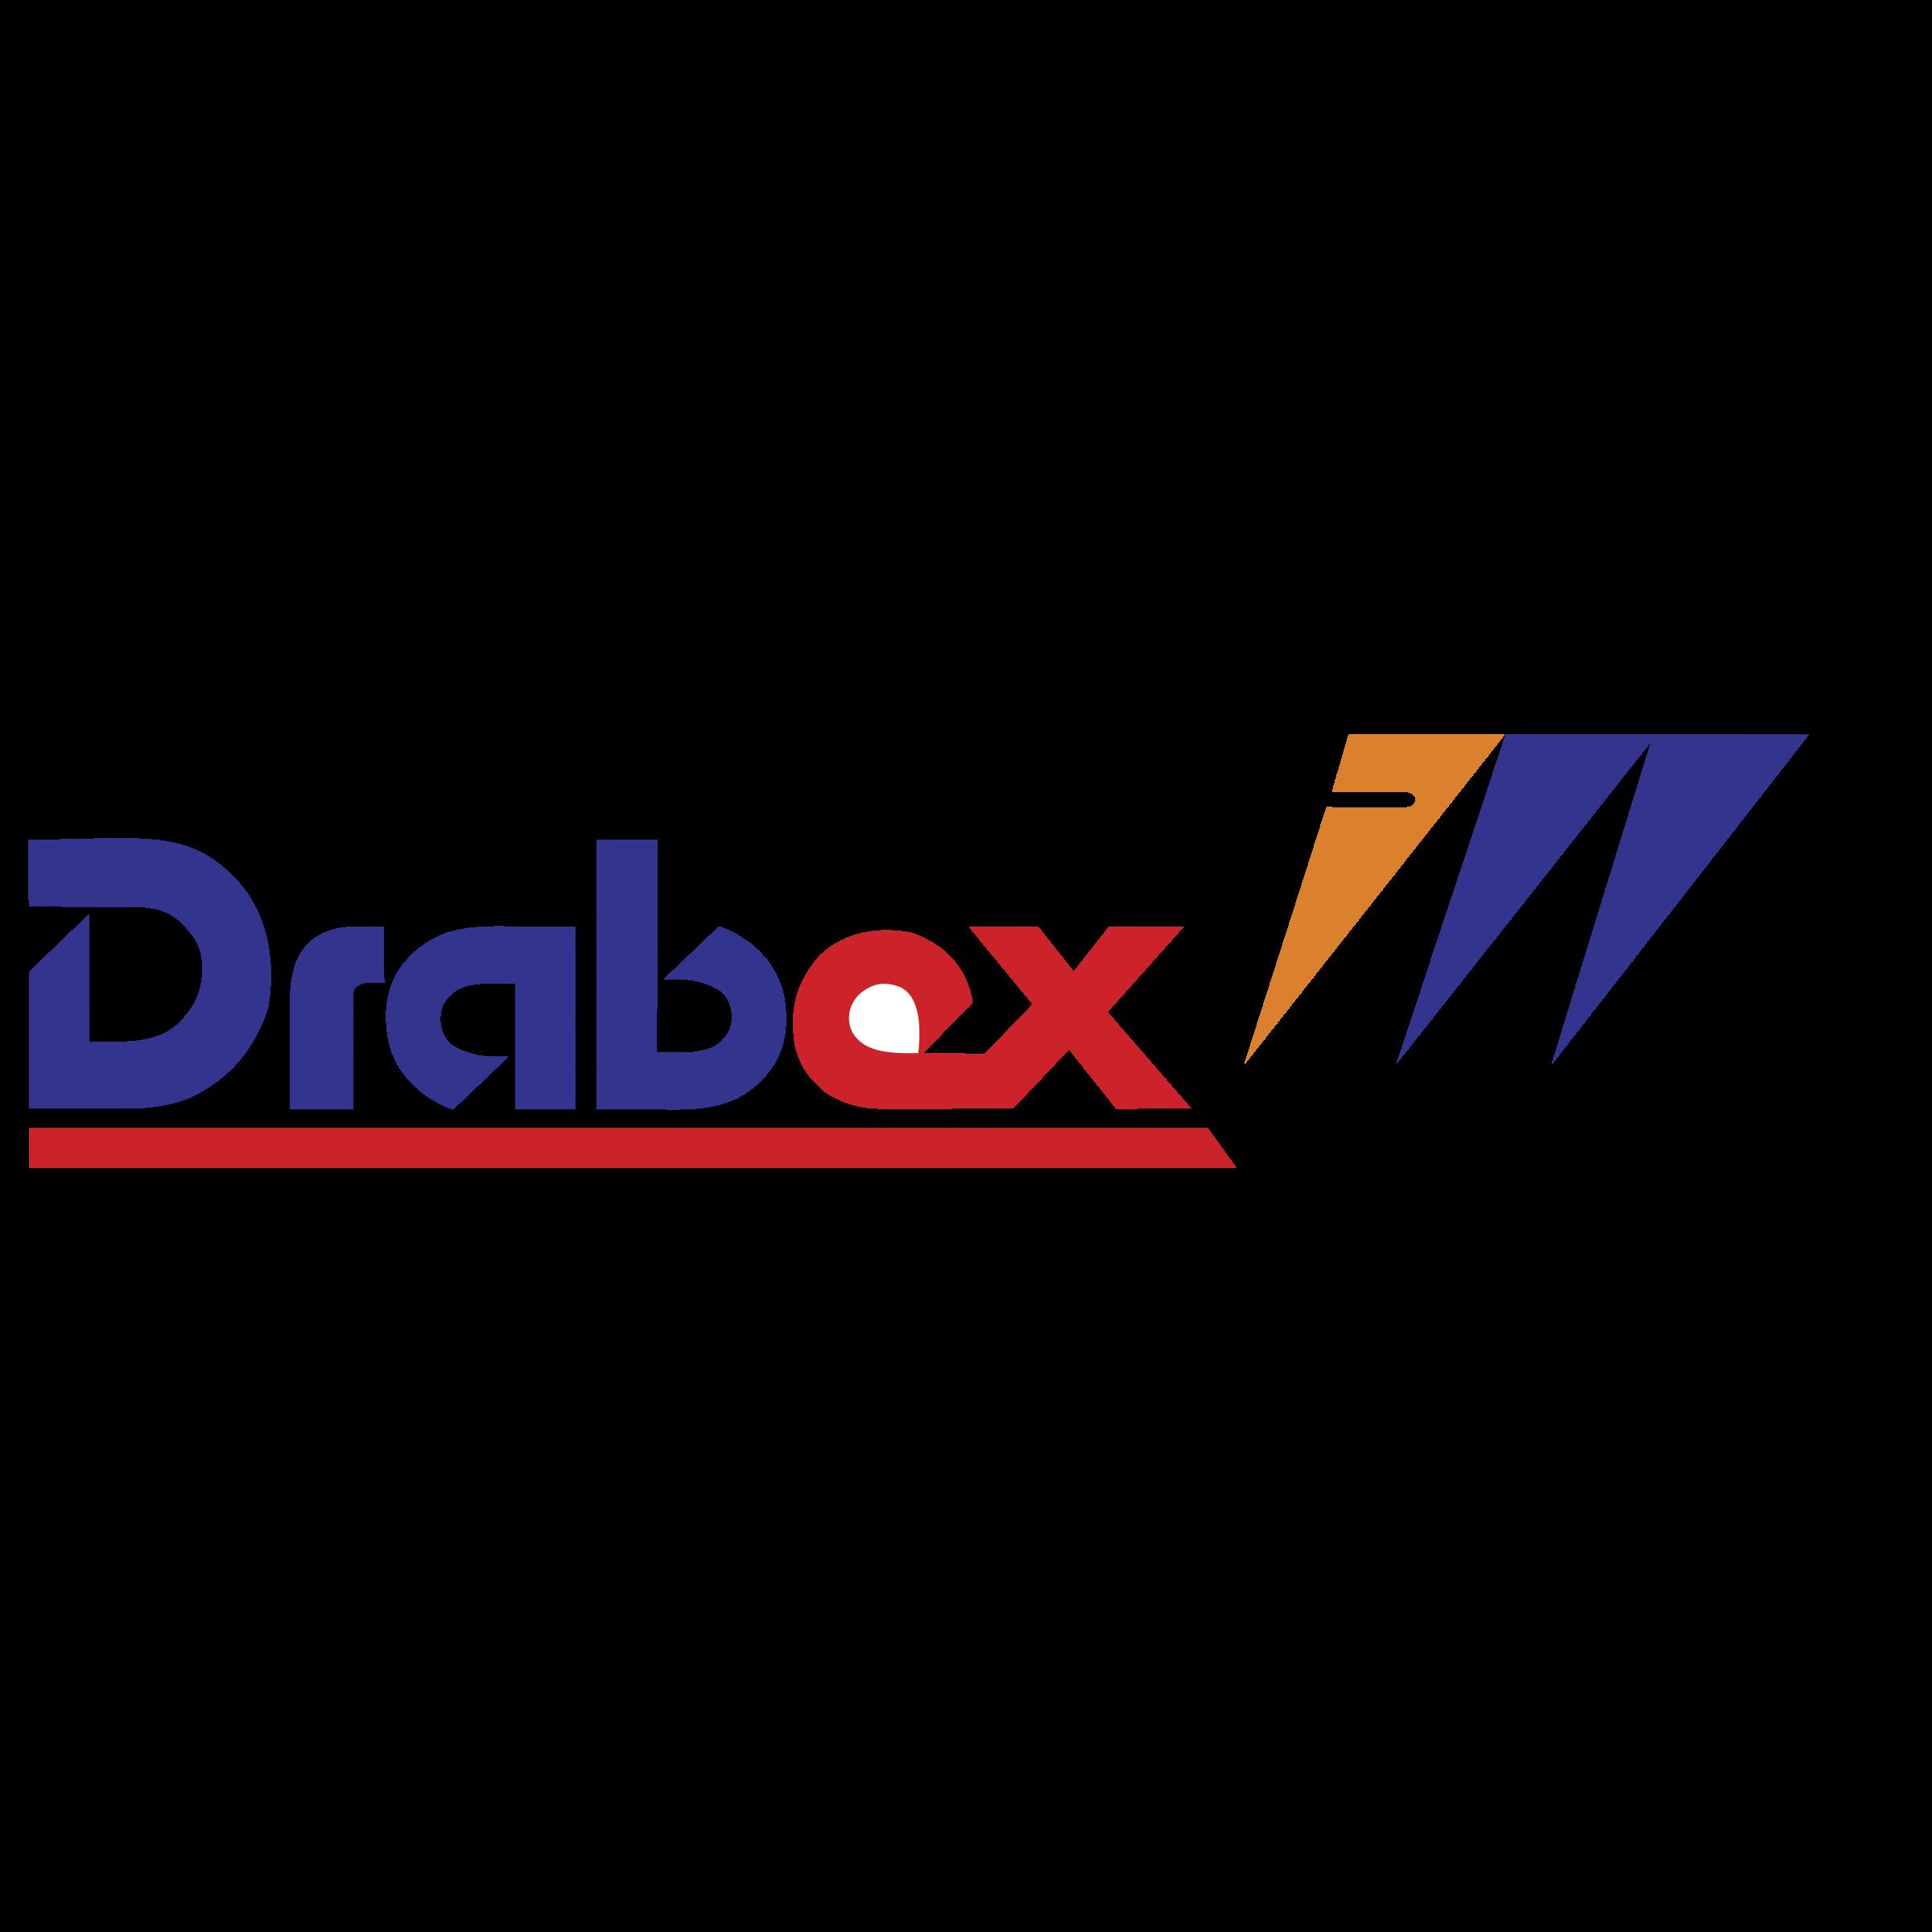 DRABEX